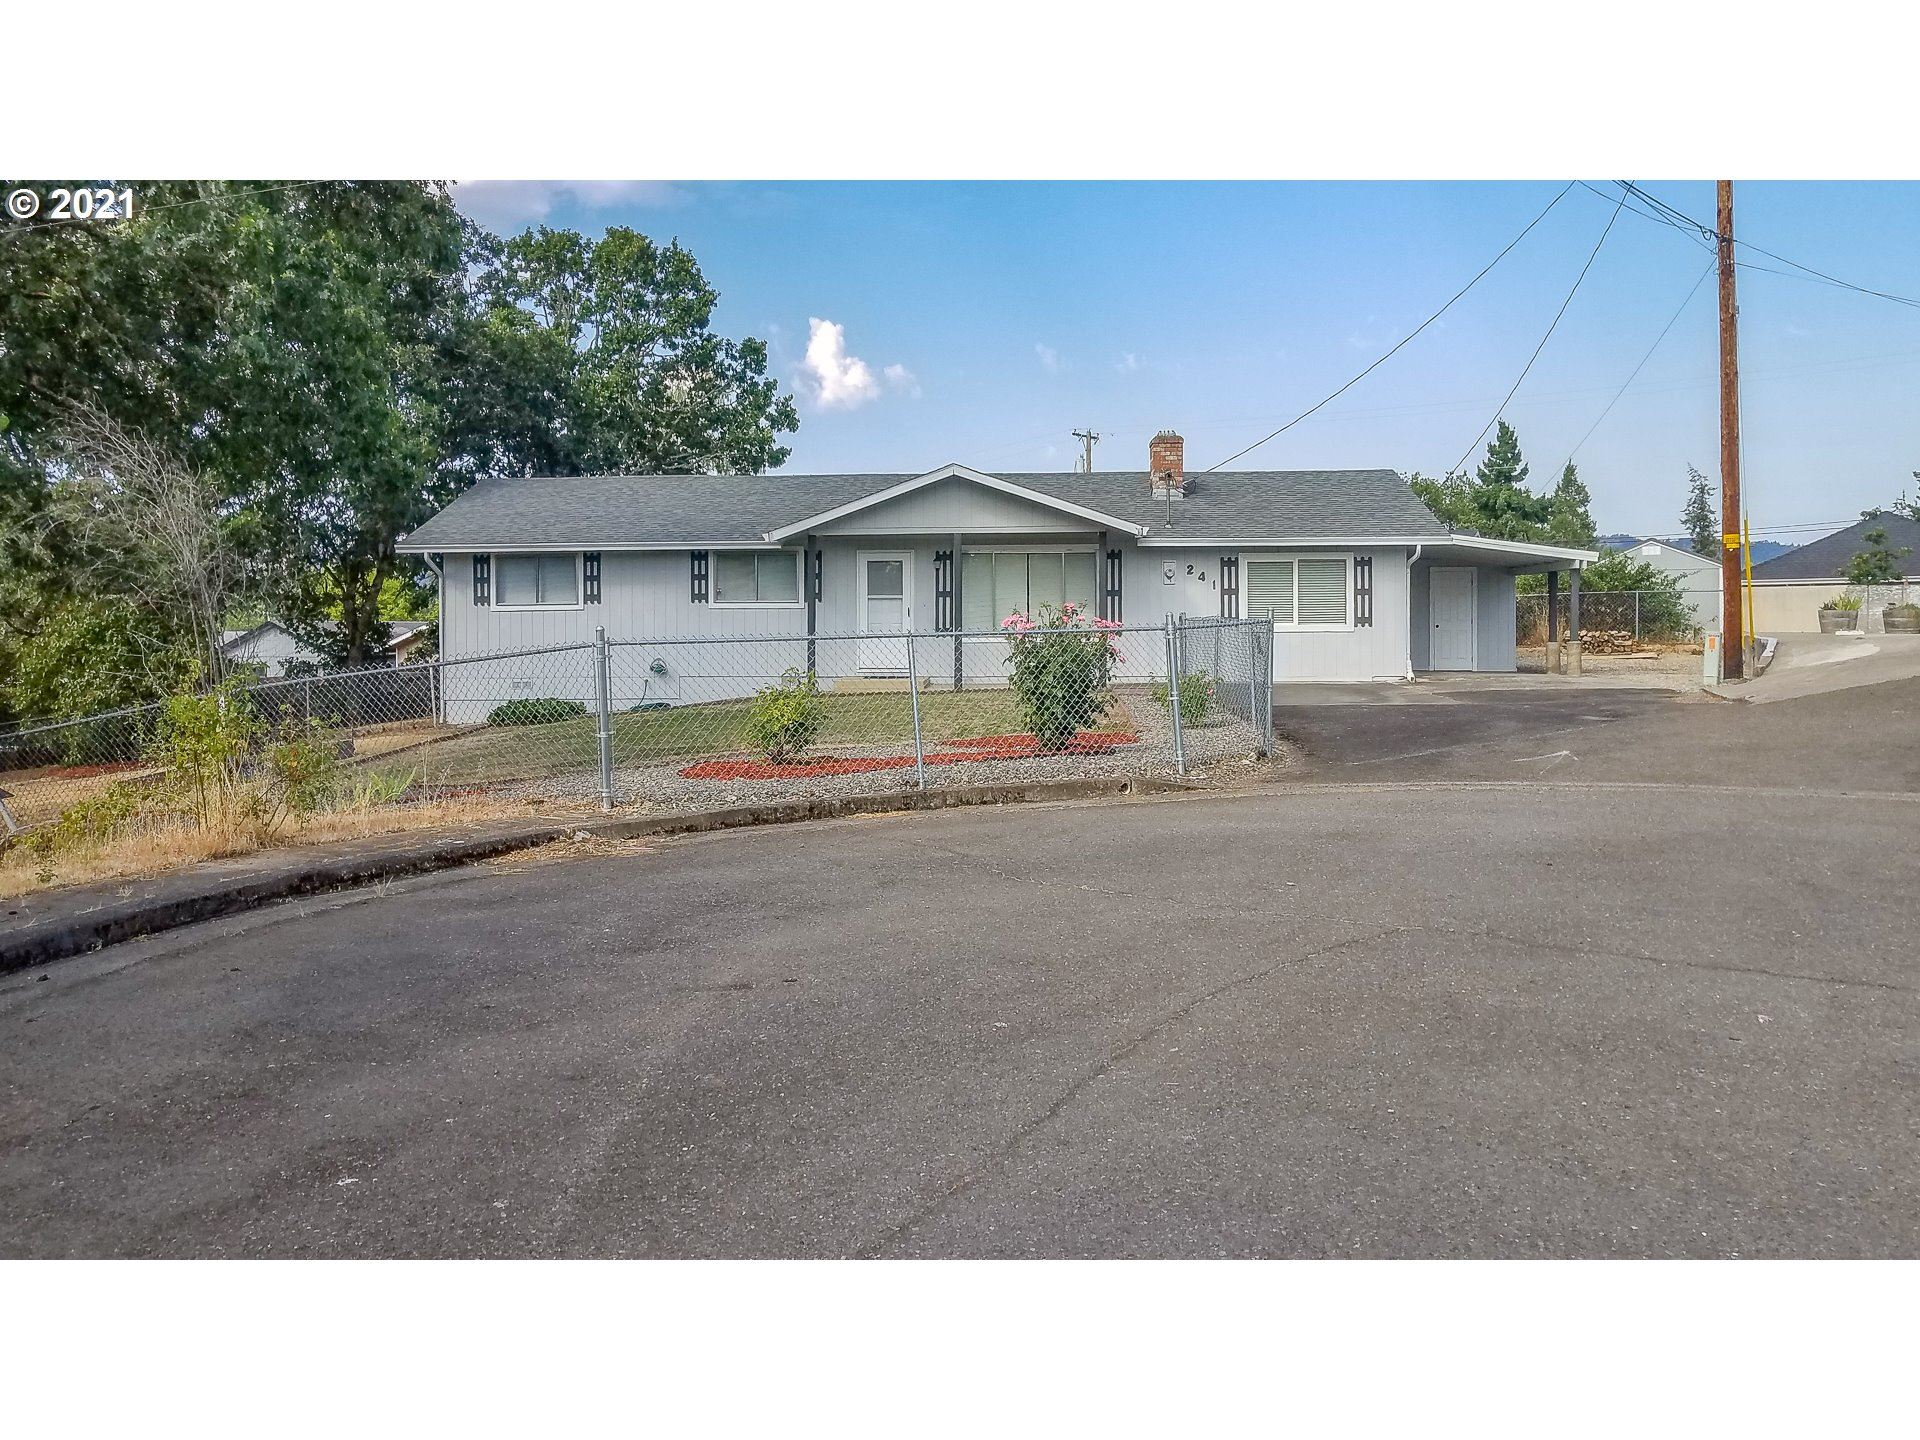 241 SE HUNGERFORD LN, Winston, OR 97496 - MLS#: 21219662